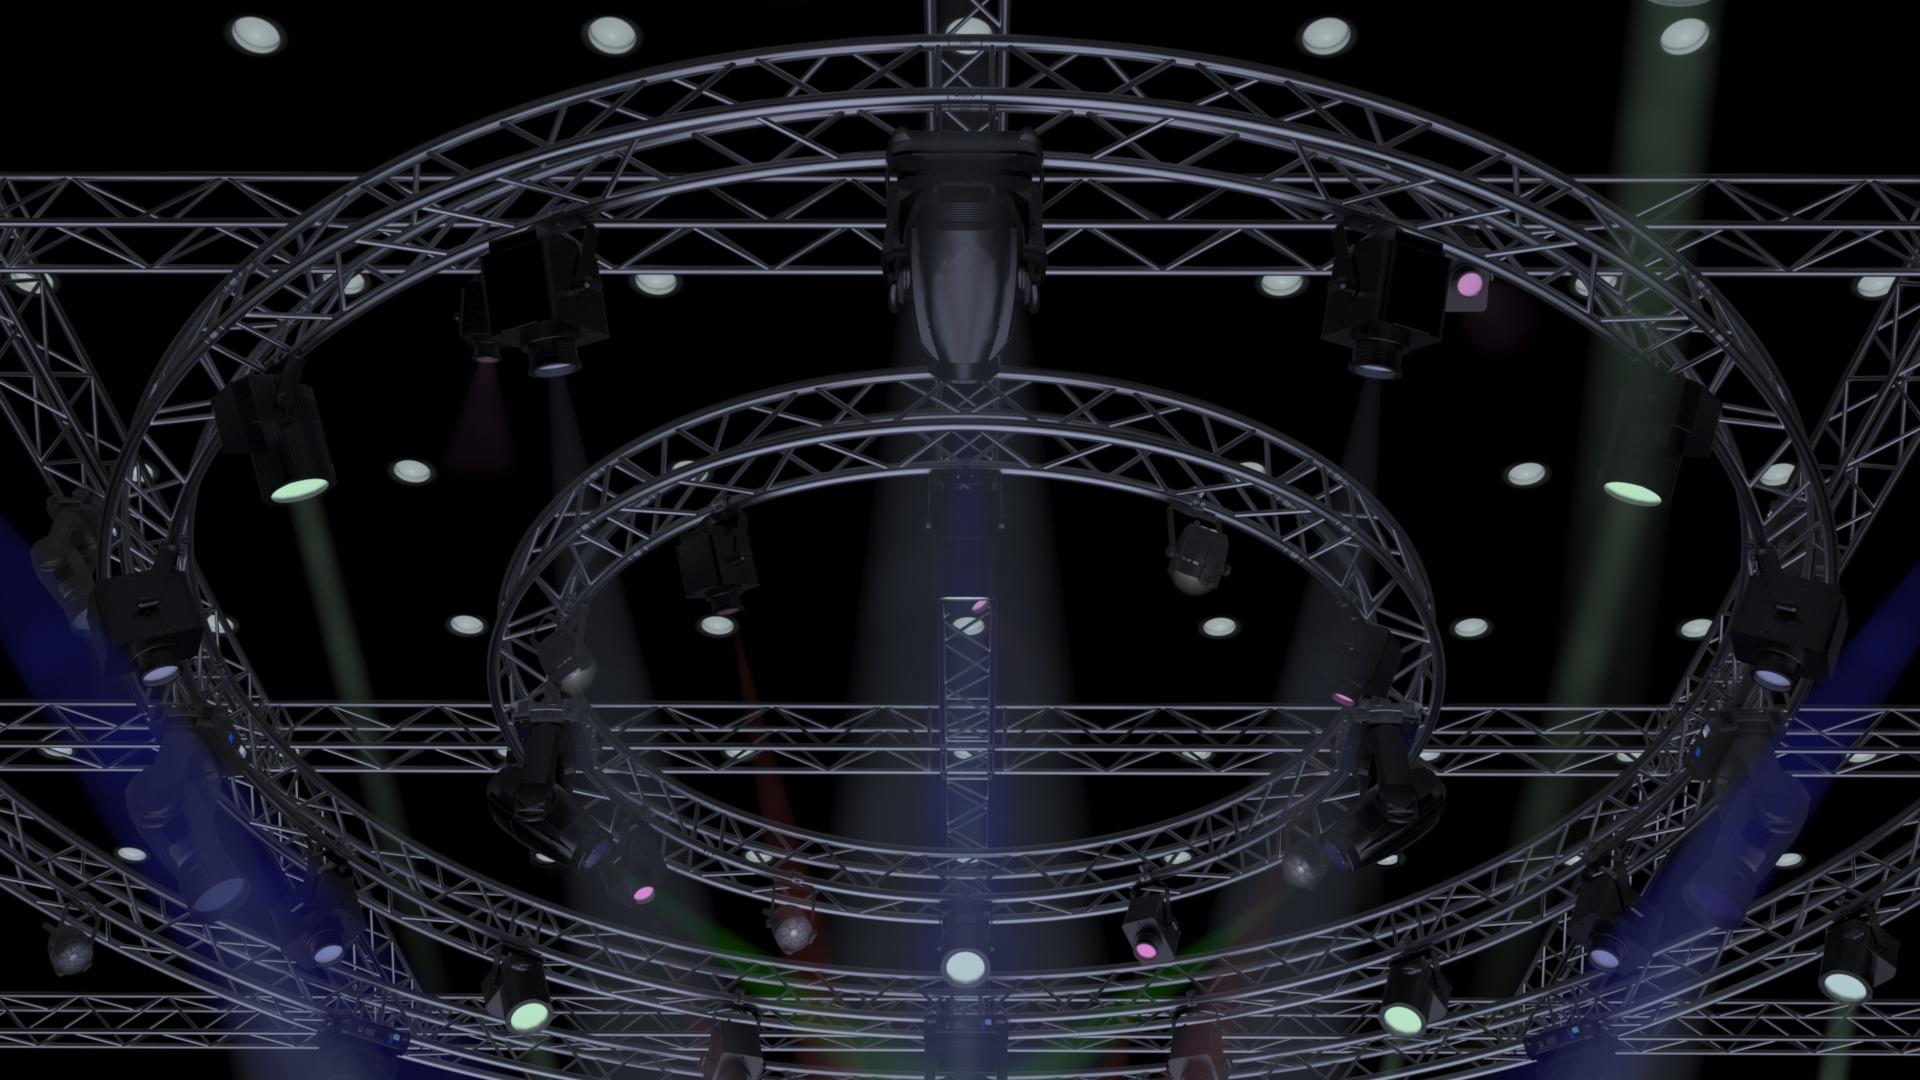 41-01-TVStudioStage-TrussLights-3